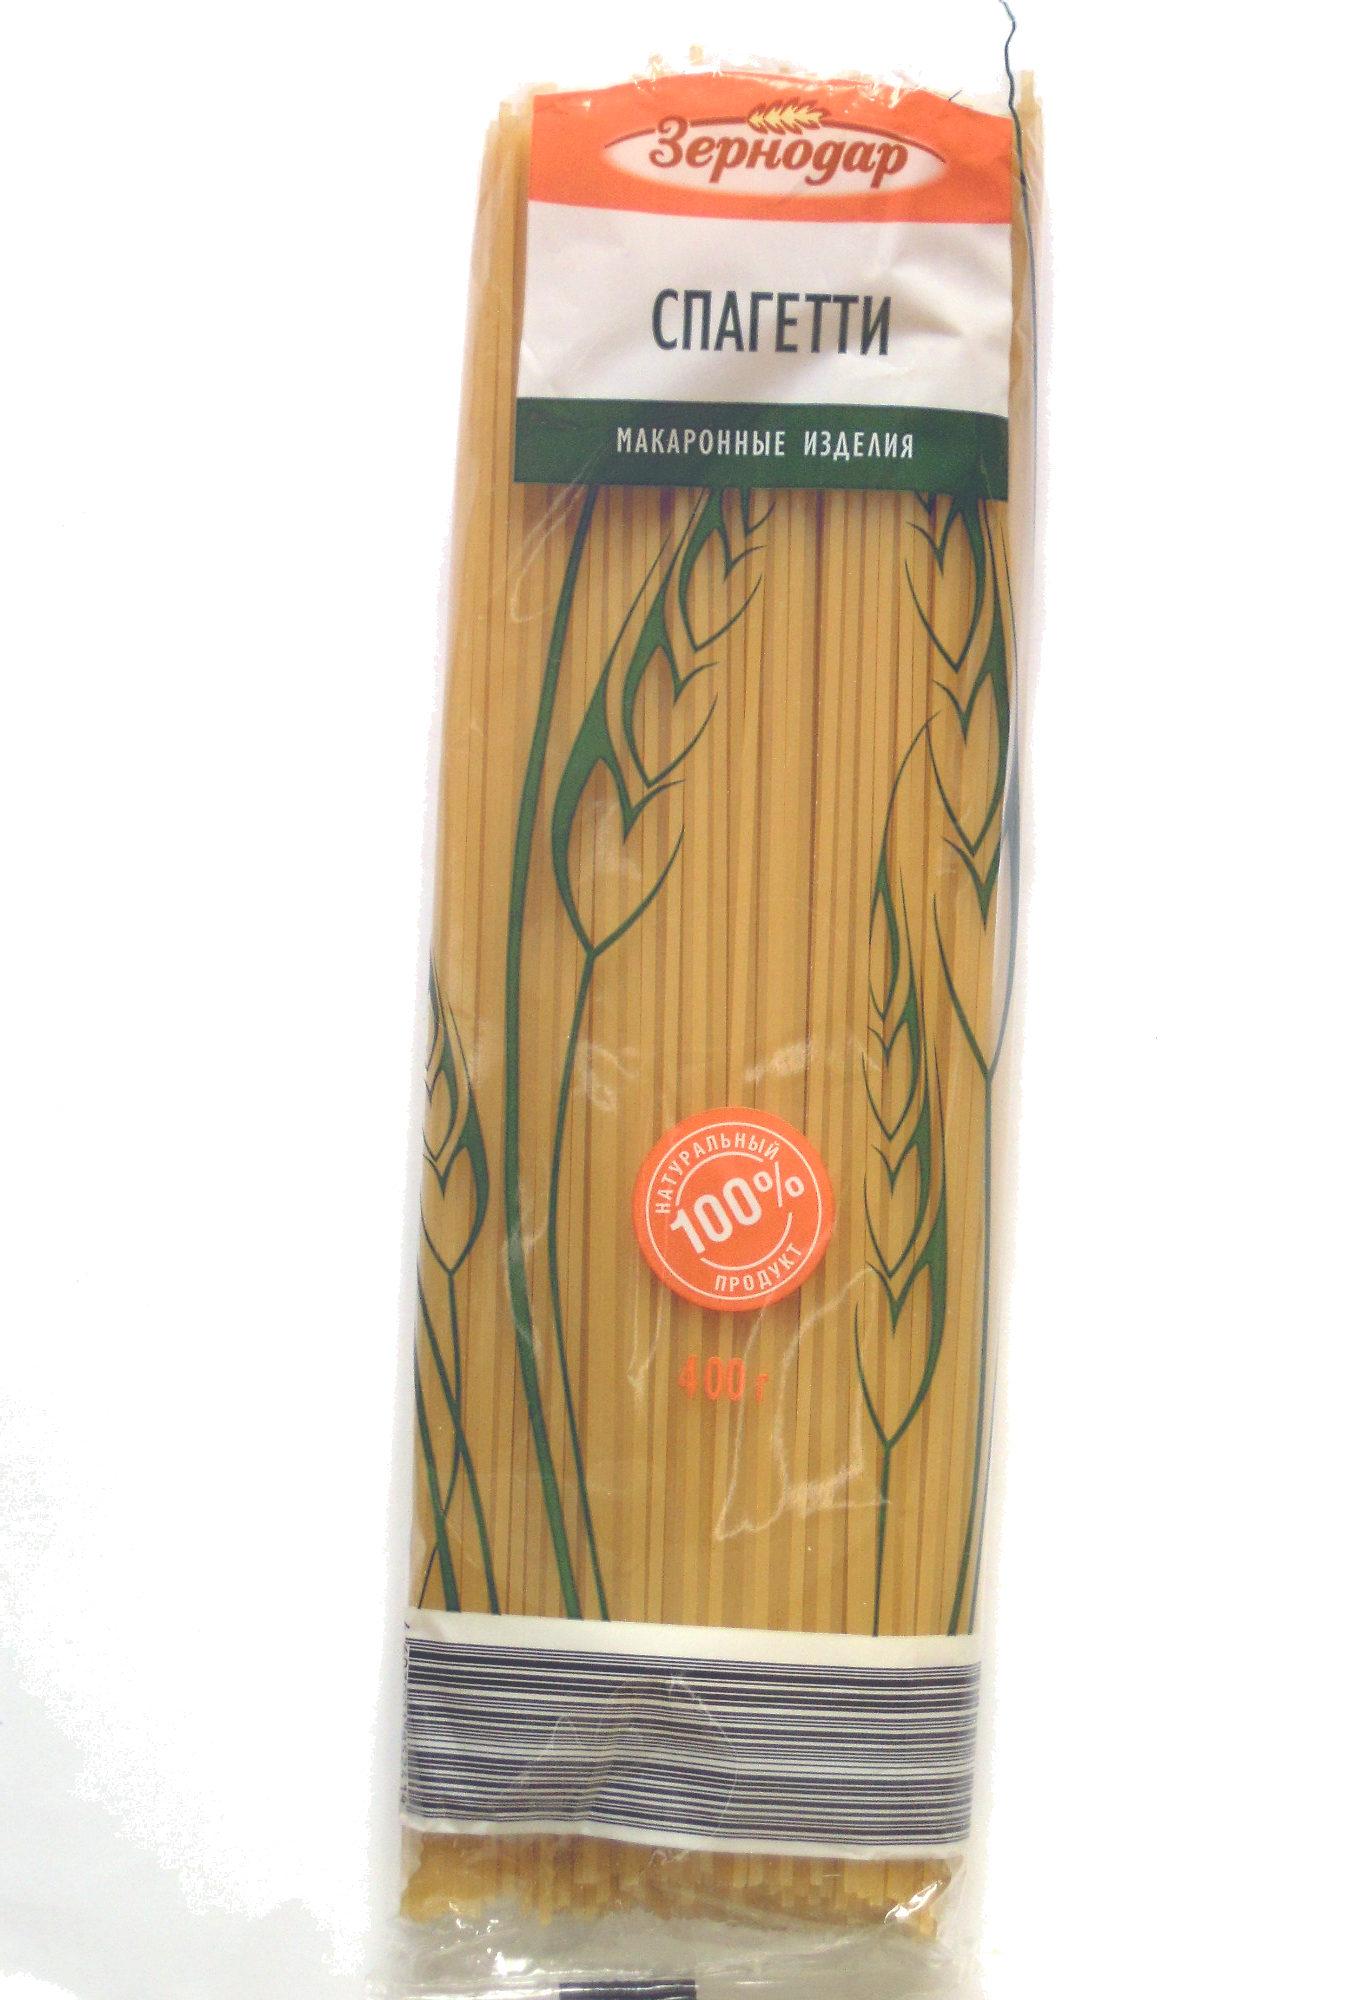 Спагетти - Product - ru